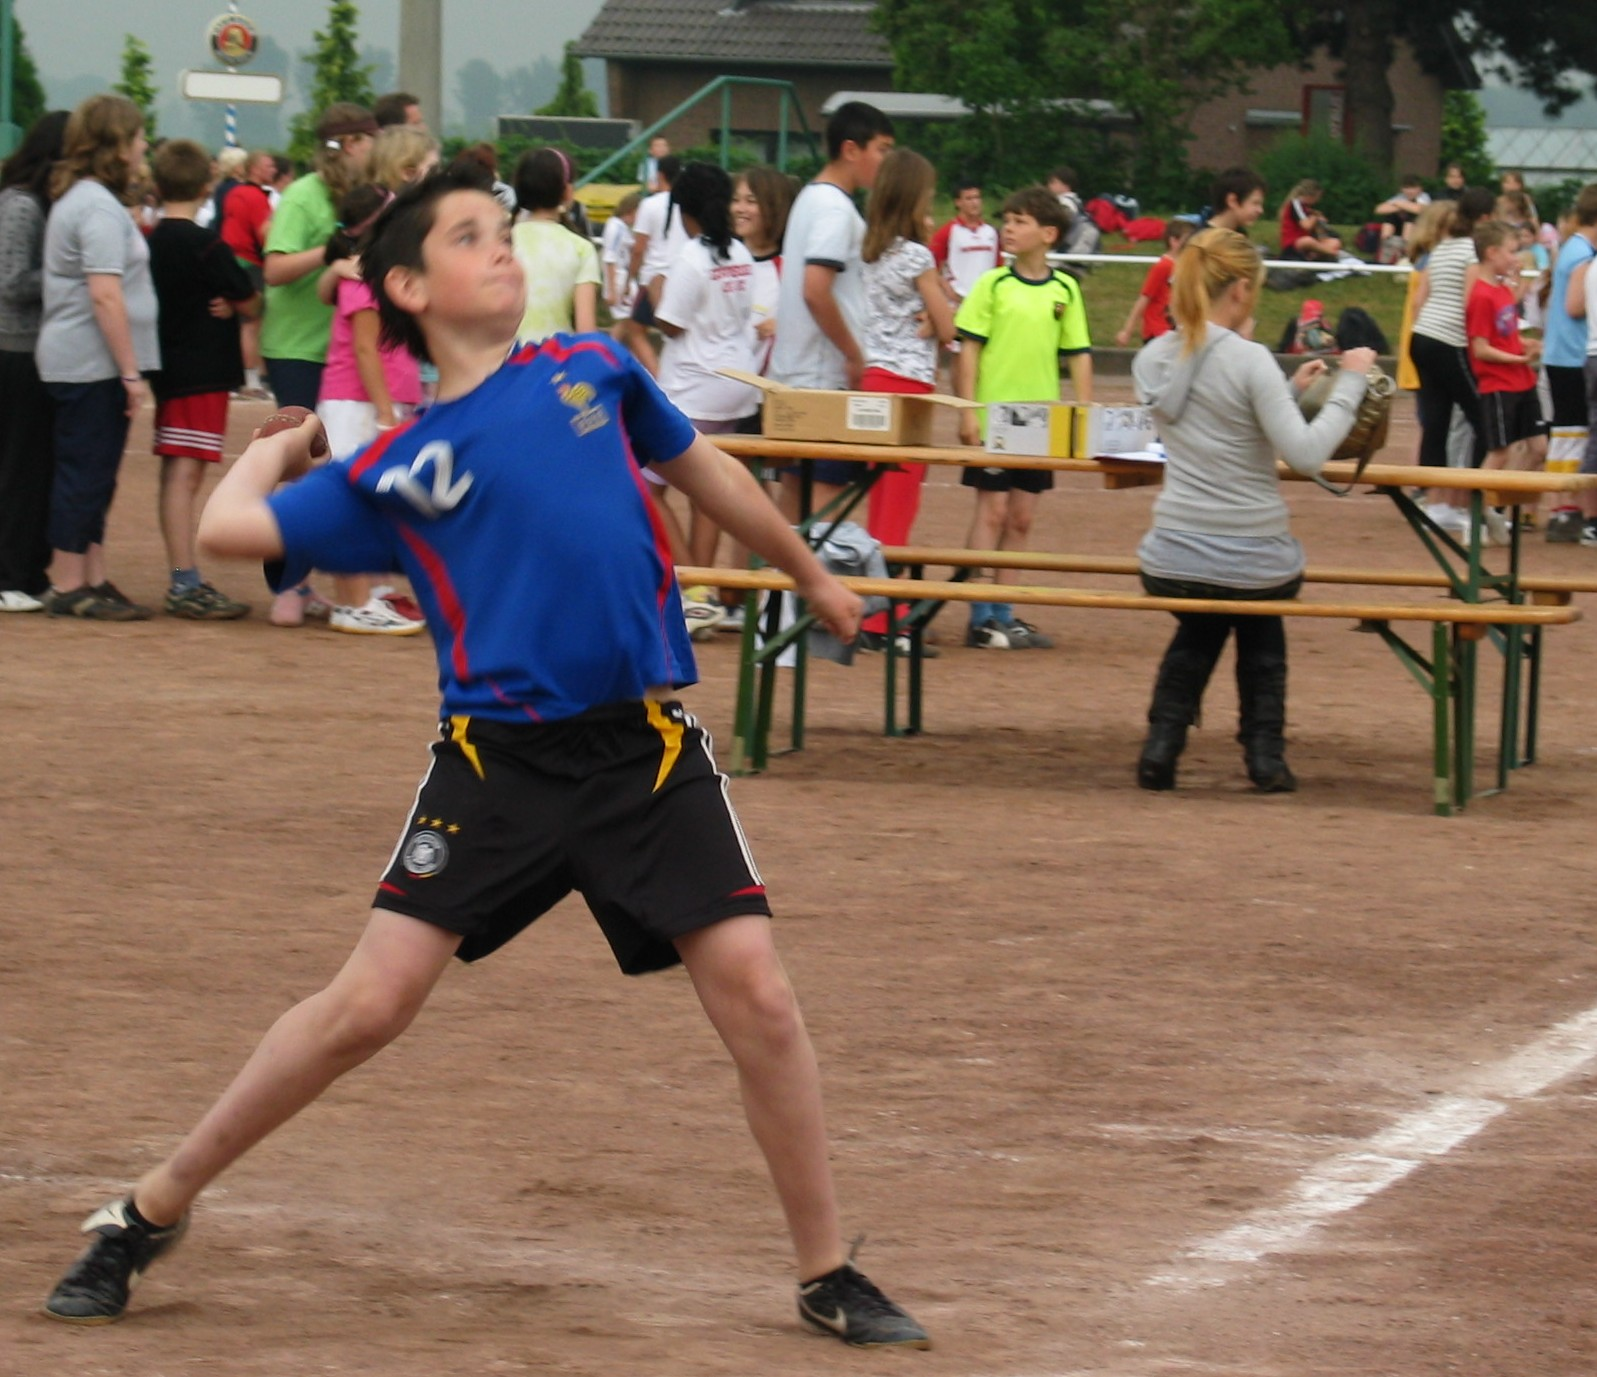 sportfest_08_wurf_03.jpg - 386,72 kB